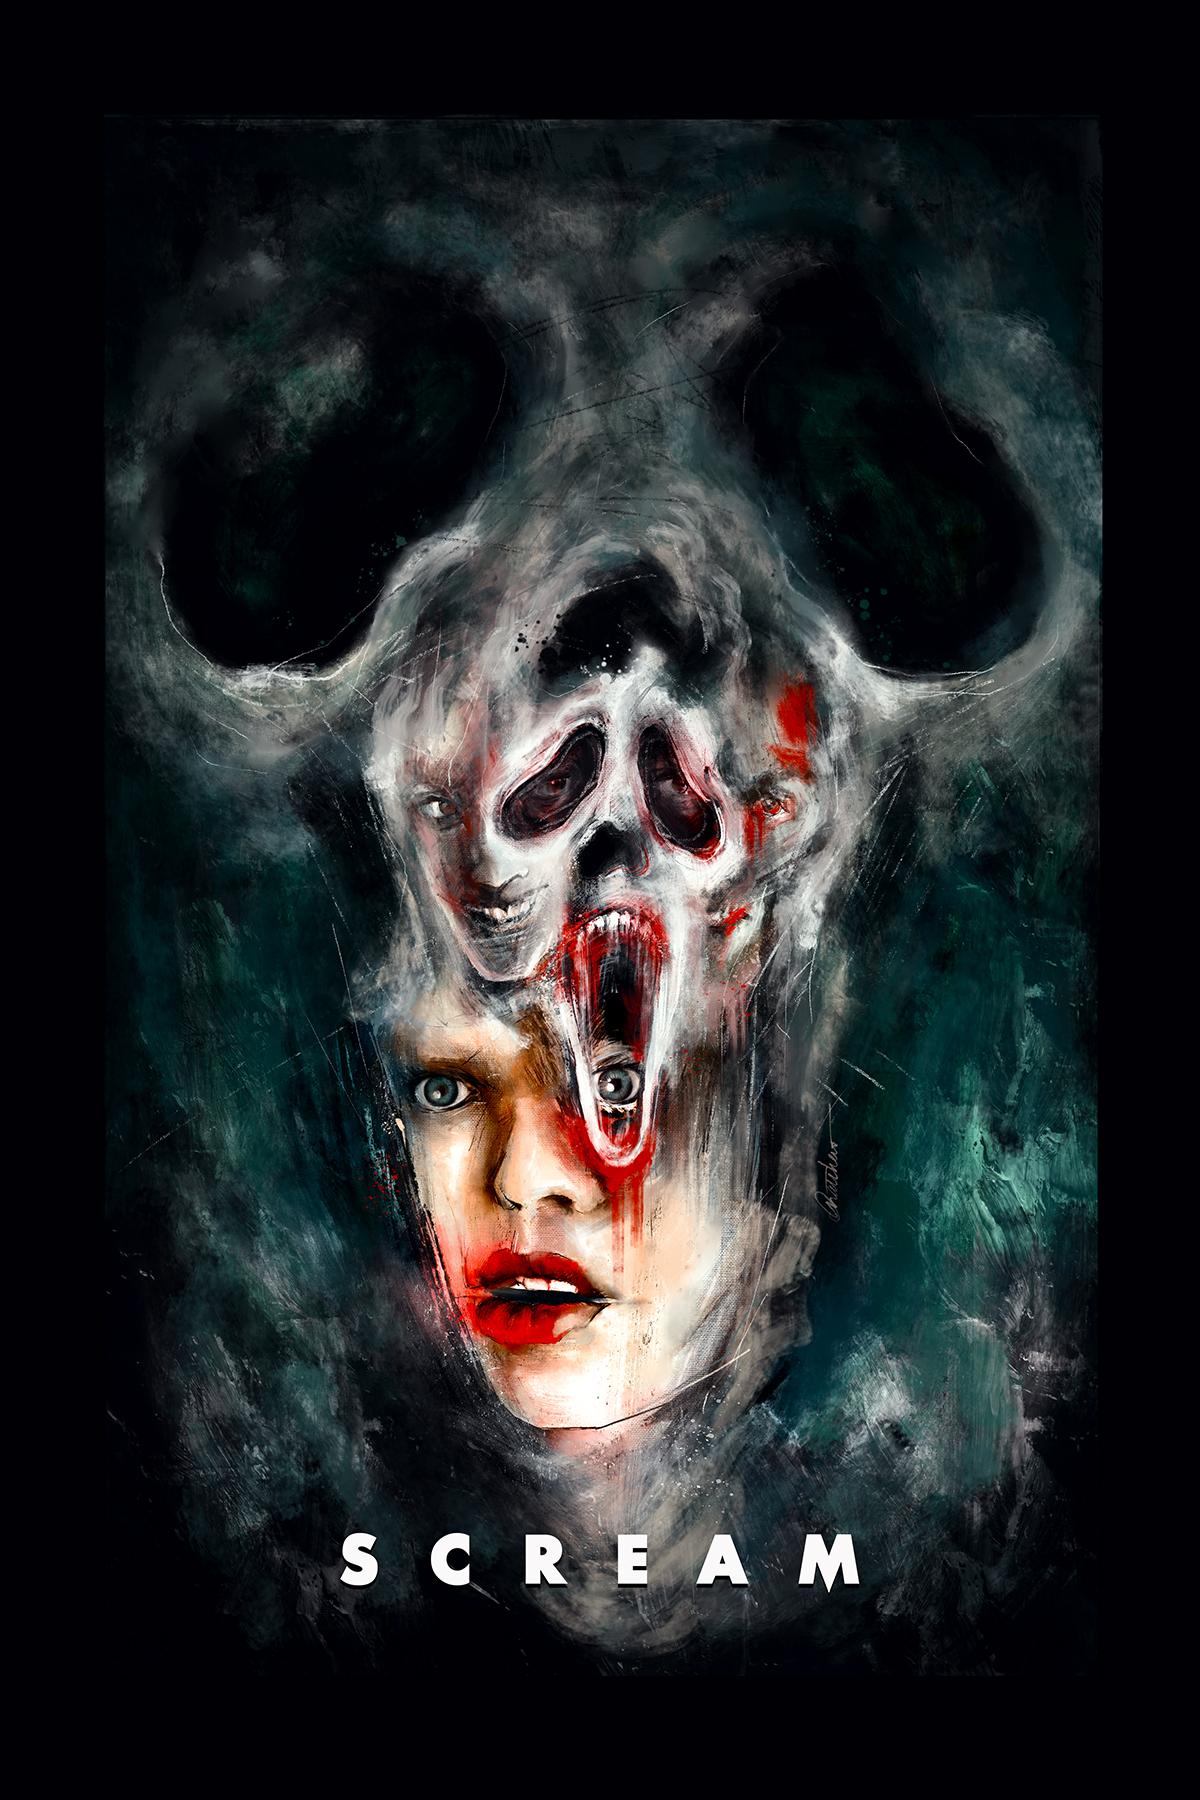 Scream_Print.jpg